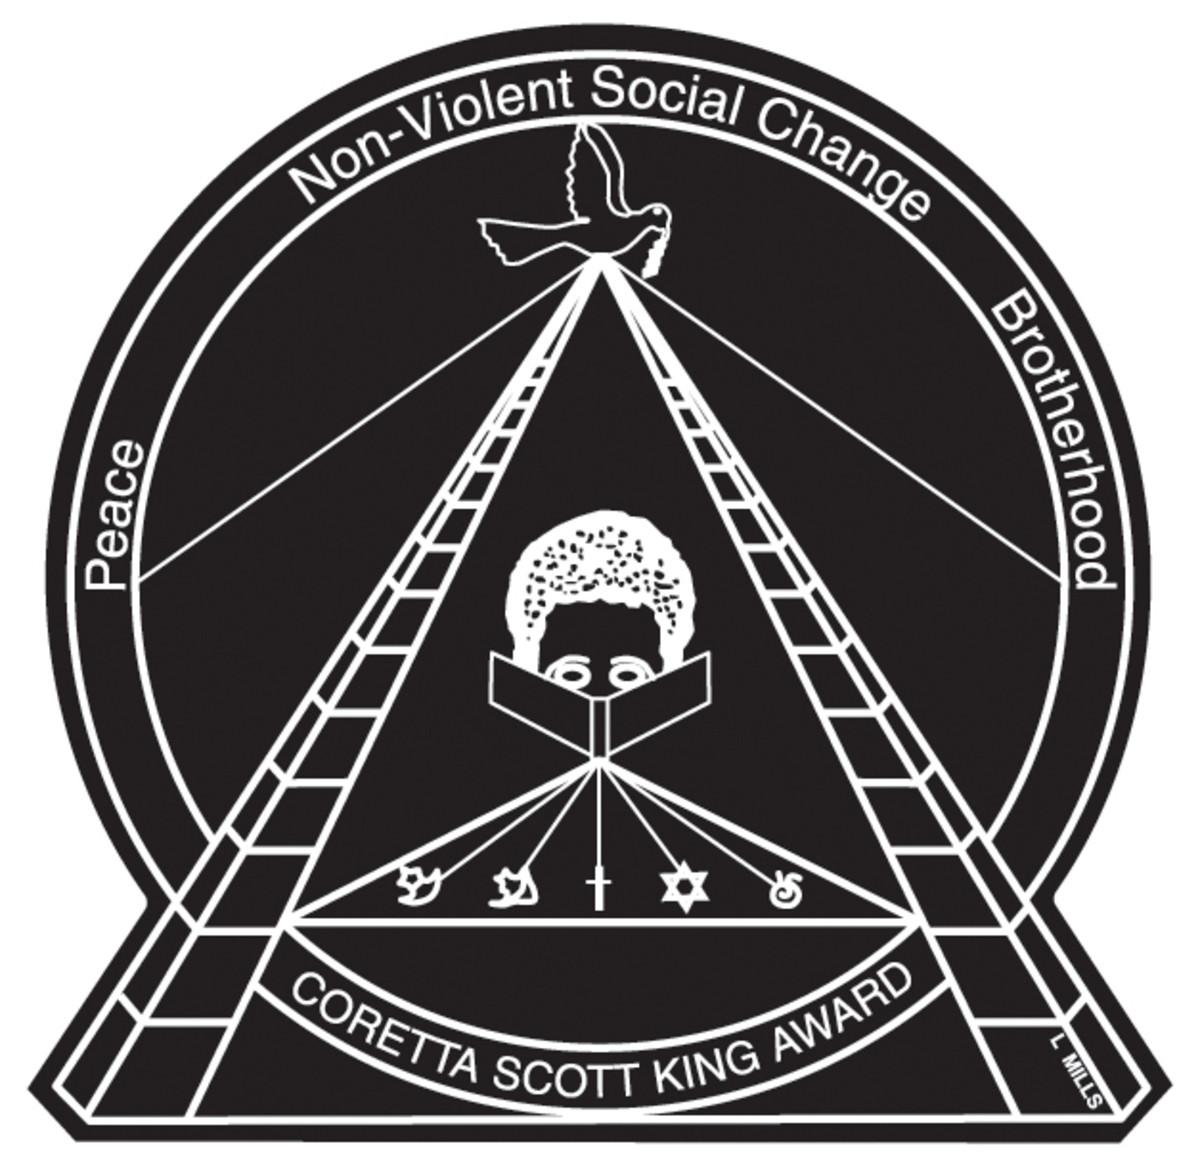 The Coretta Scott King Medal